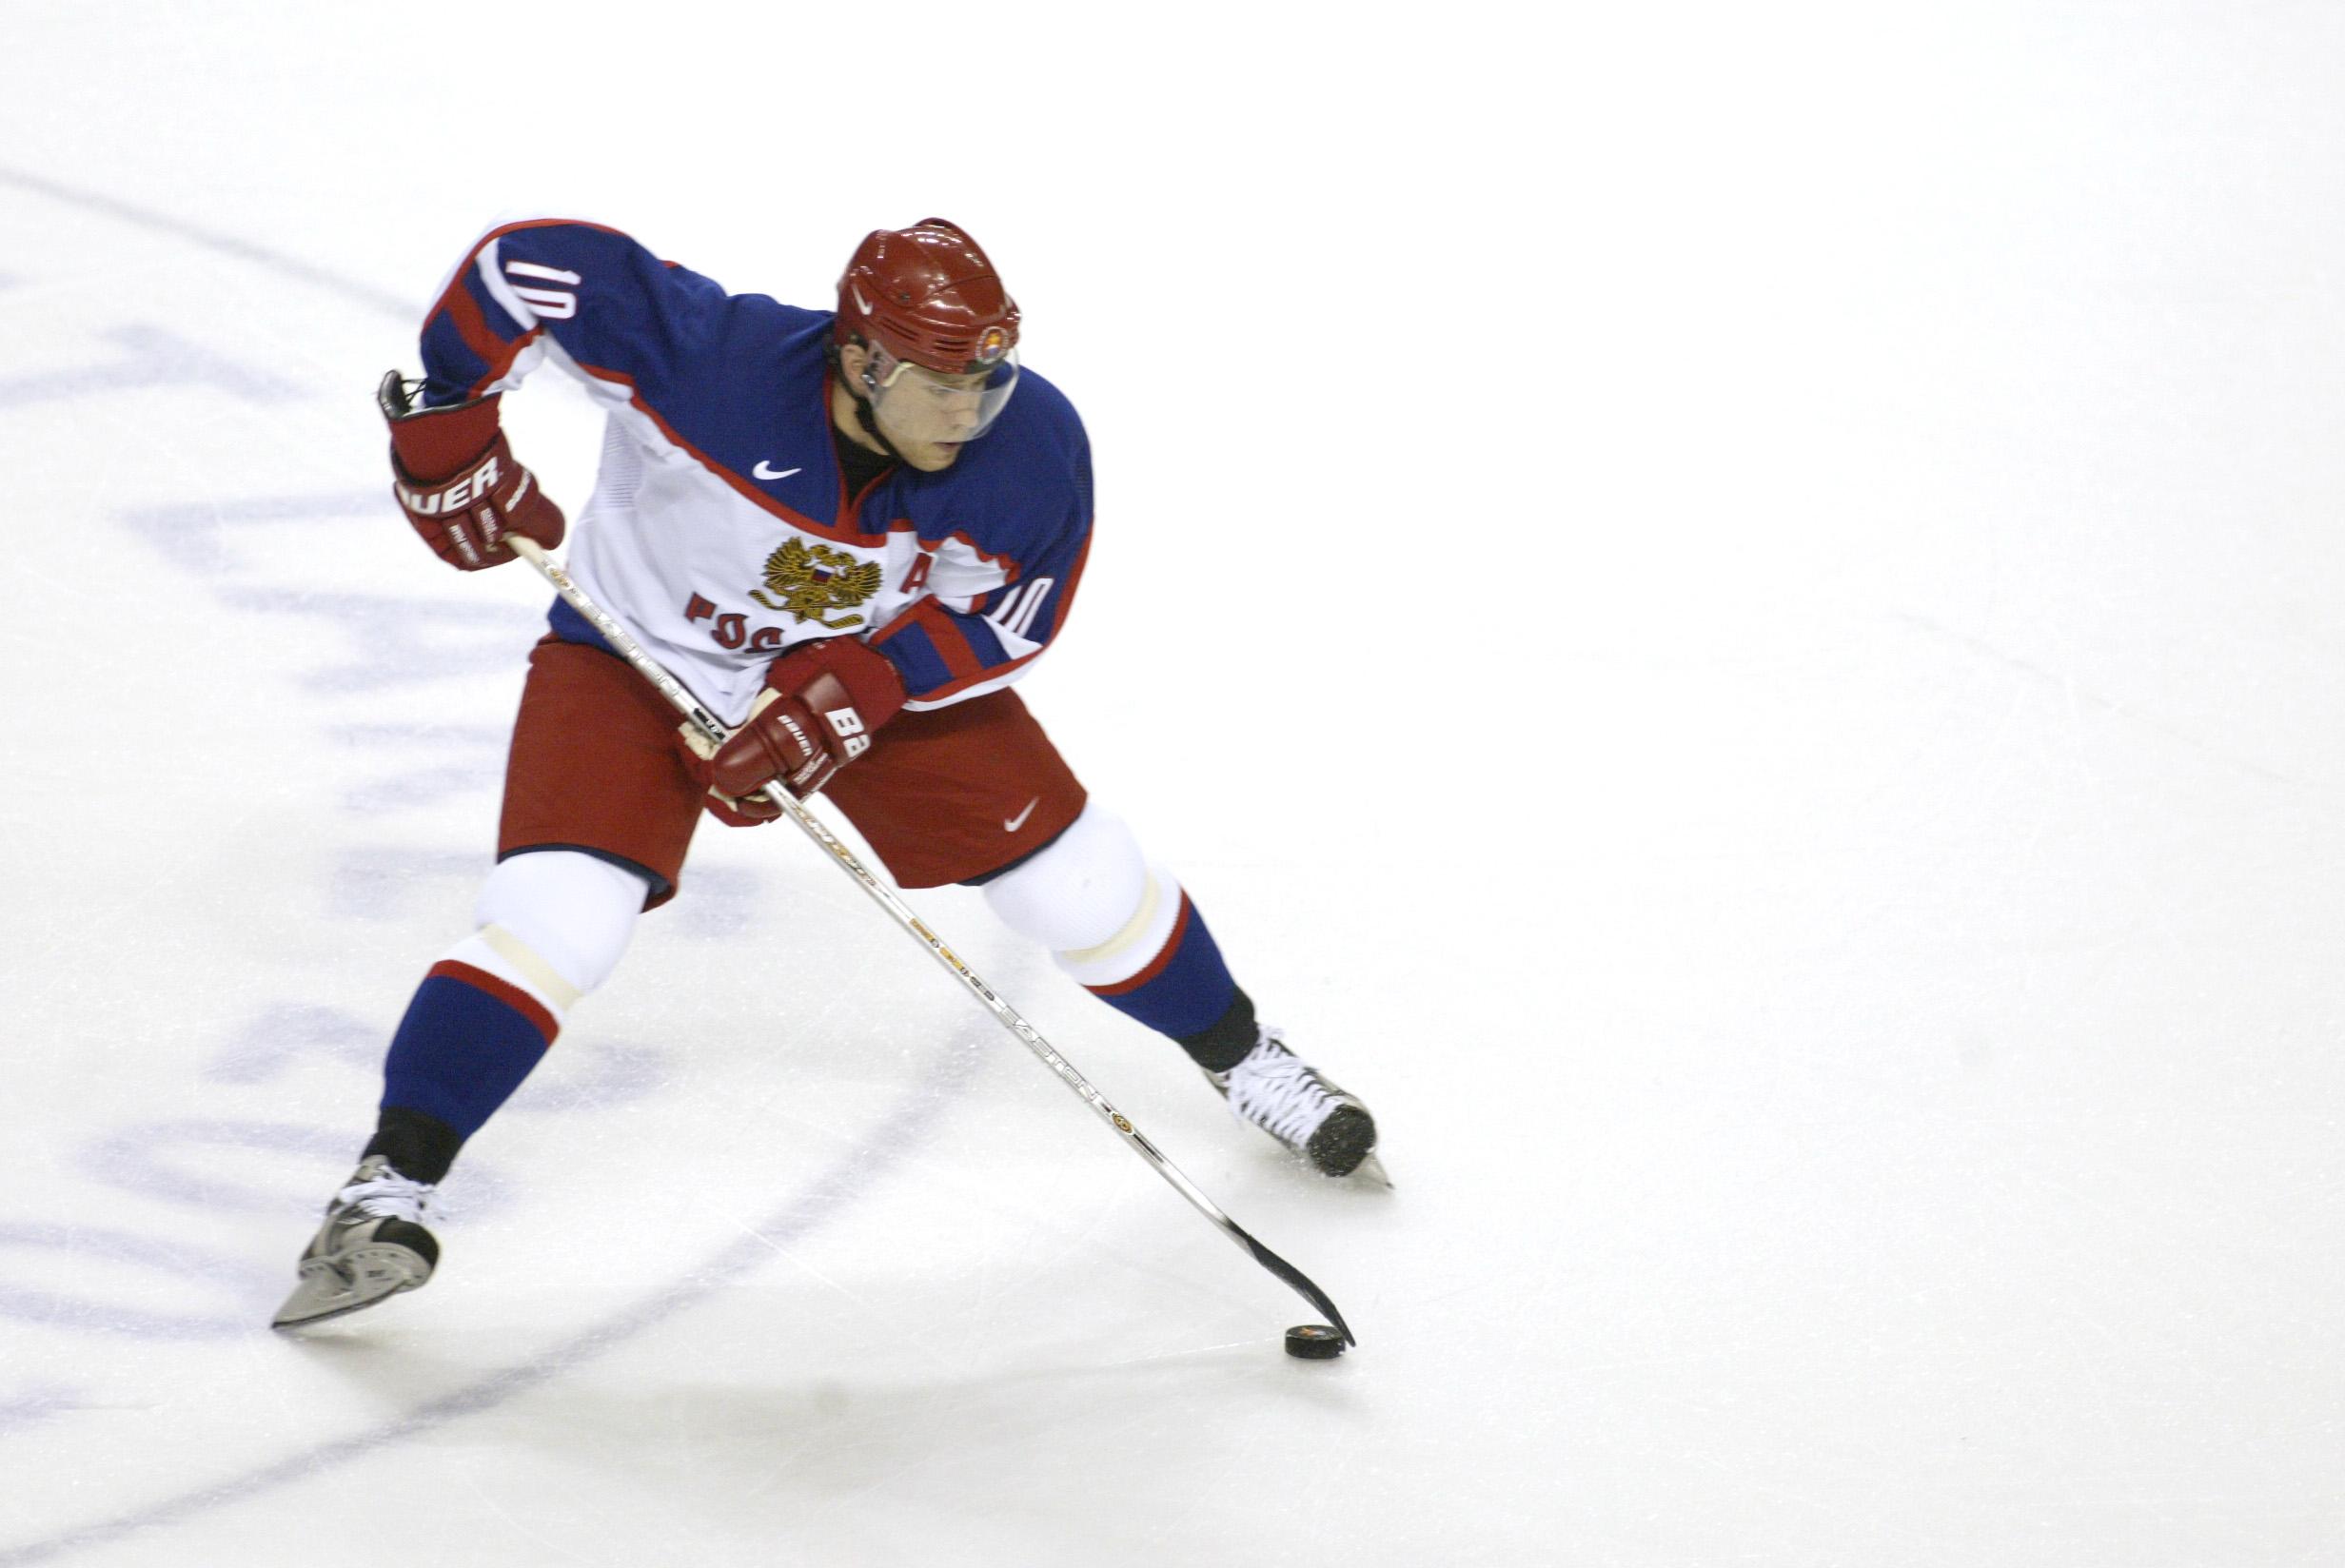 22 Feb 2002:   Pavel Bure #10 of Russia skates through center ice during men's semifinals at the Salt Lake City Winter Olympic Games at the E Center in Salt Lake City, Utah. DIGITAL IMAGE. Mandatory Credit:   Adam Pretty/Getty Images